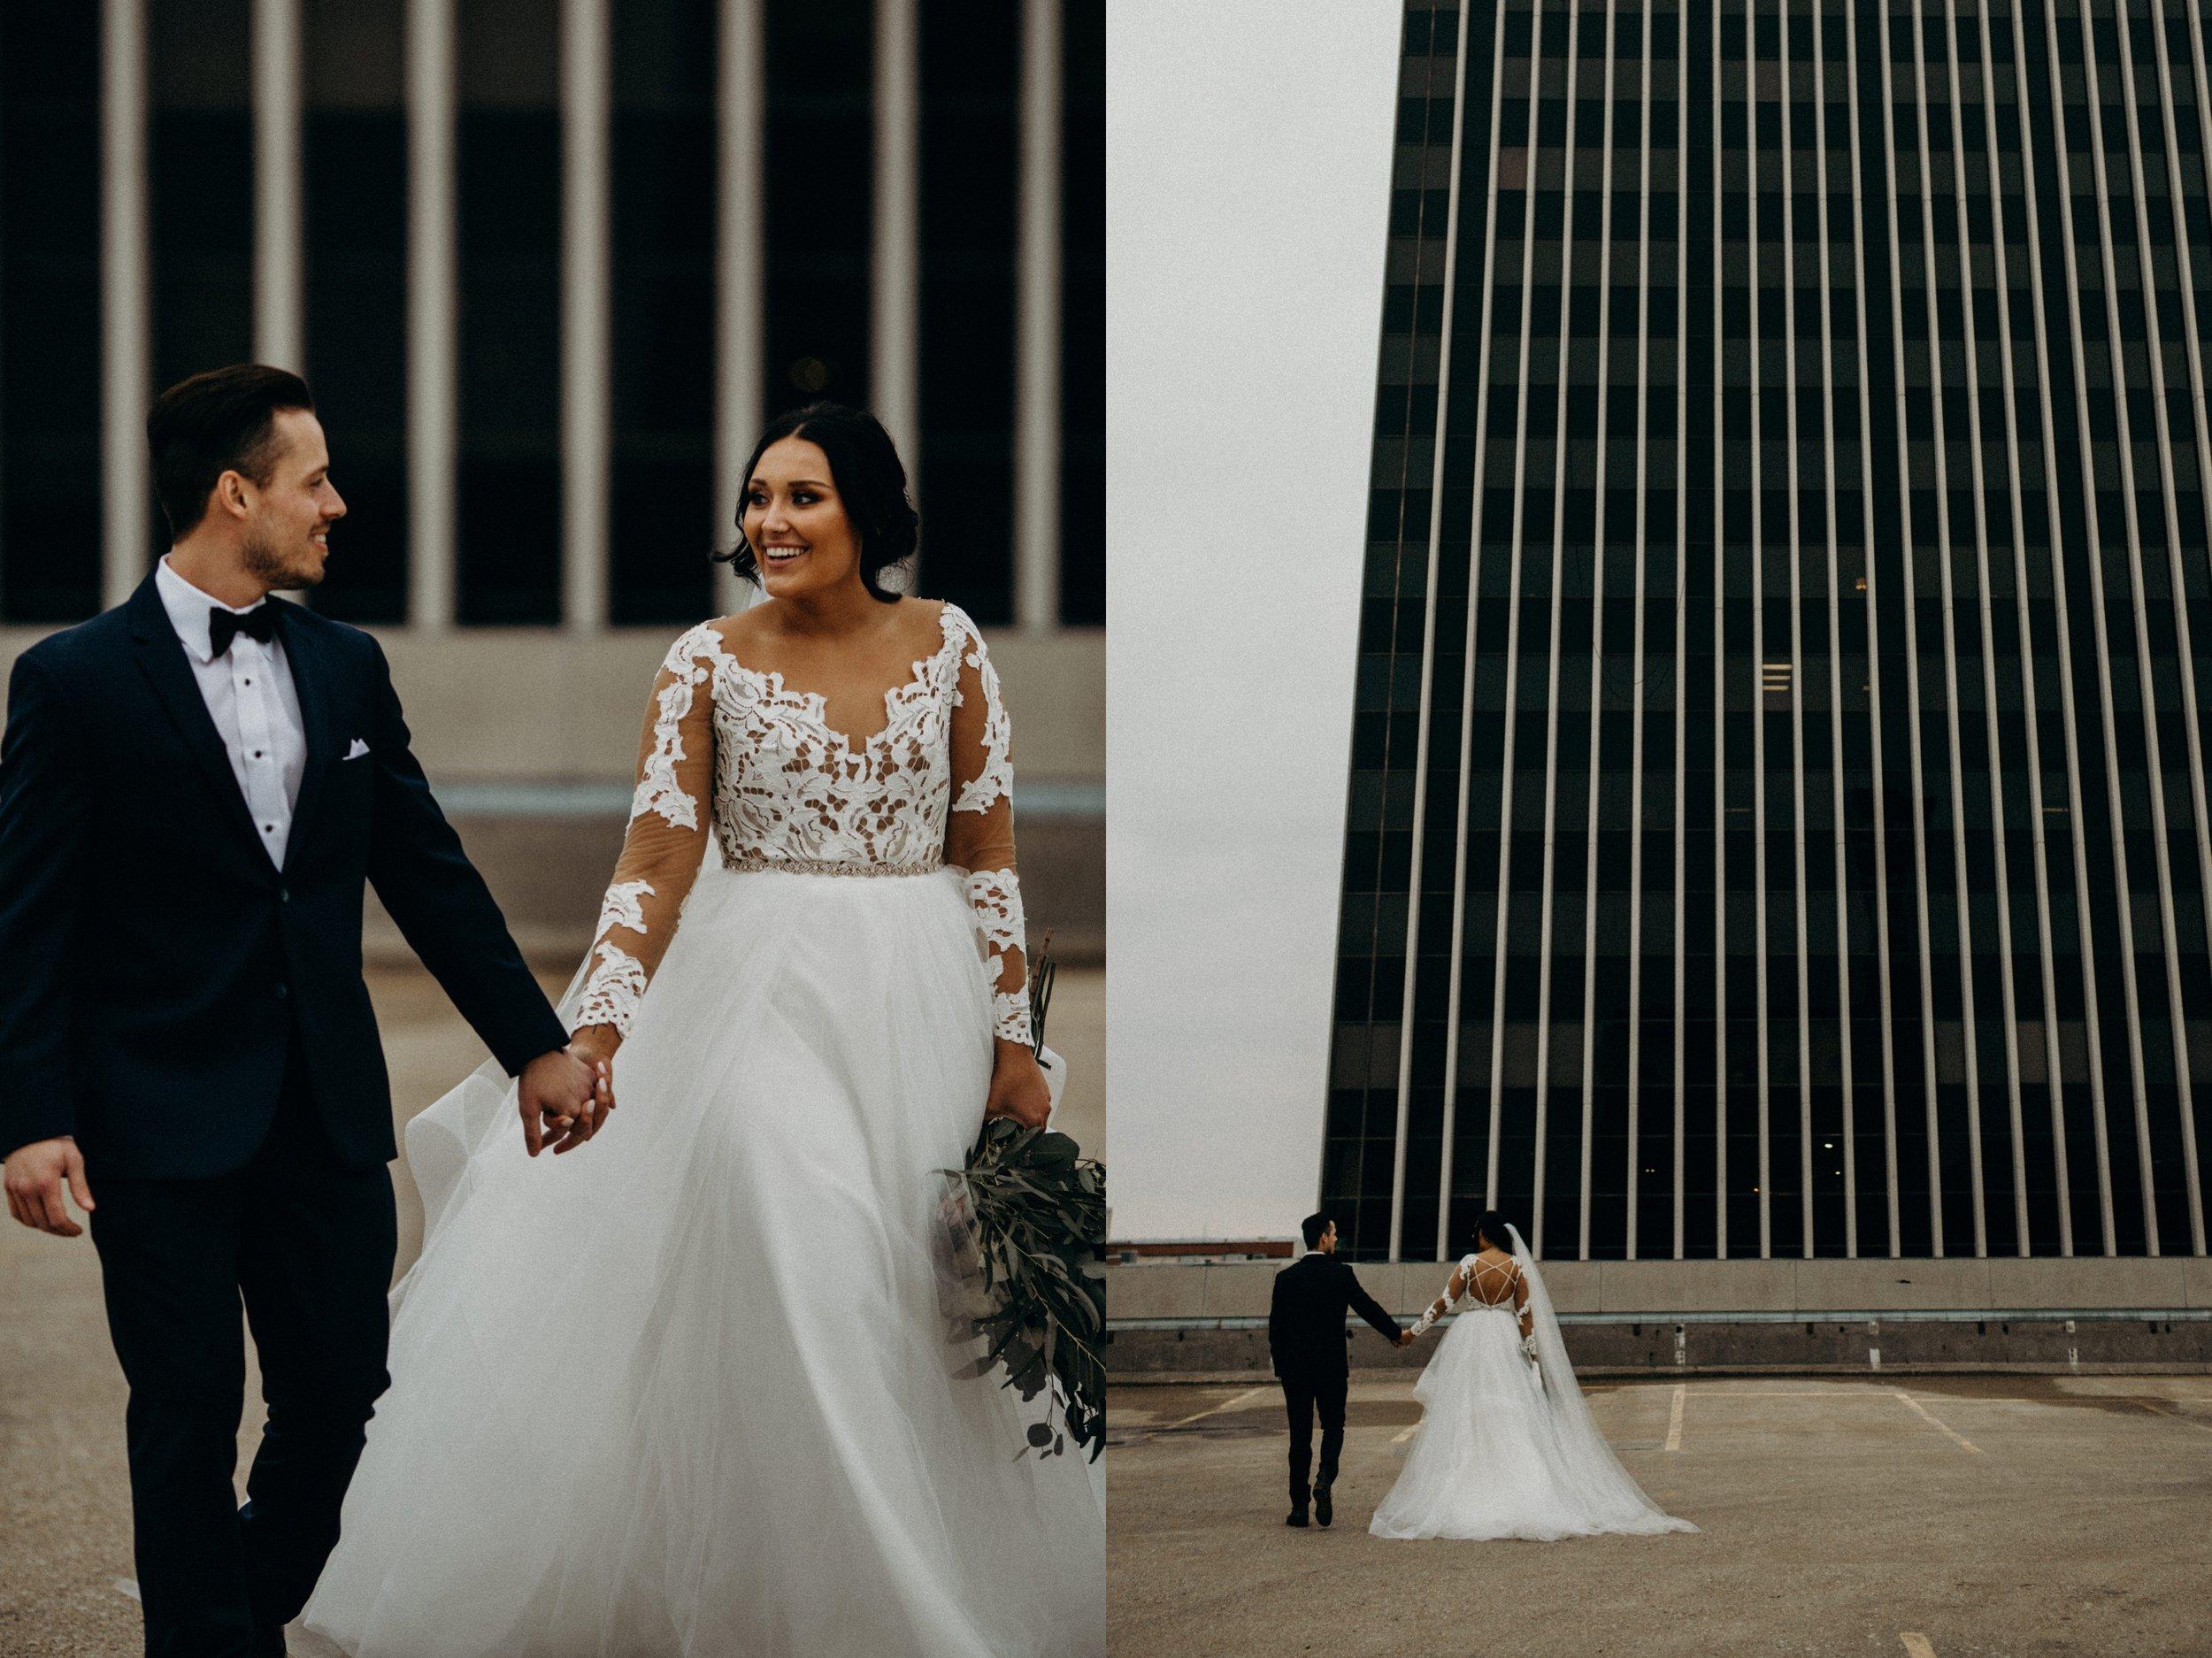 trinjensen photography, nebraska outdoor wedding photographer_3243.jpg